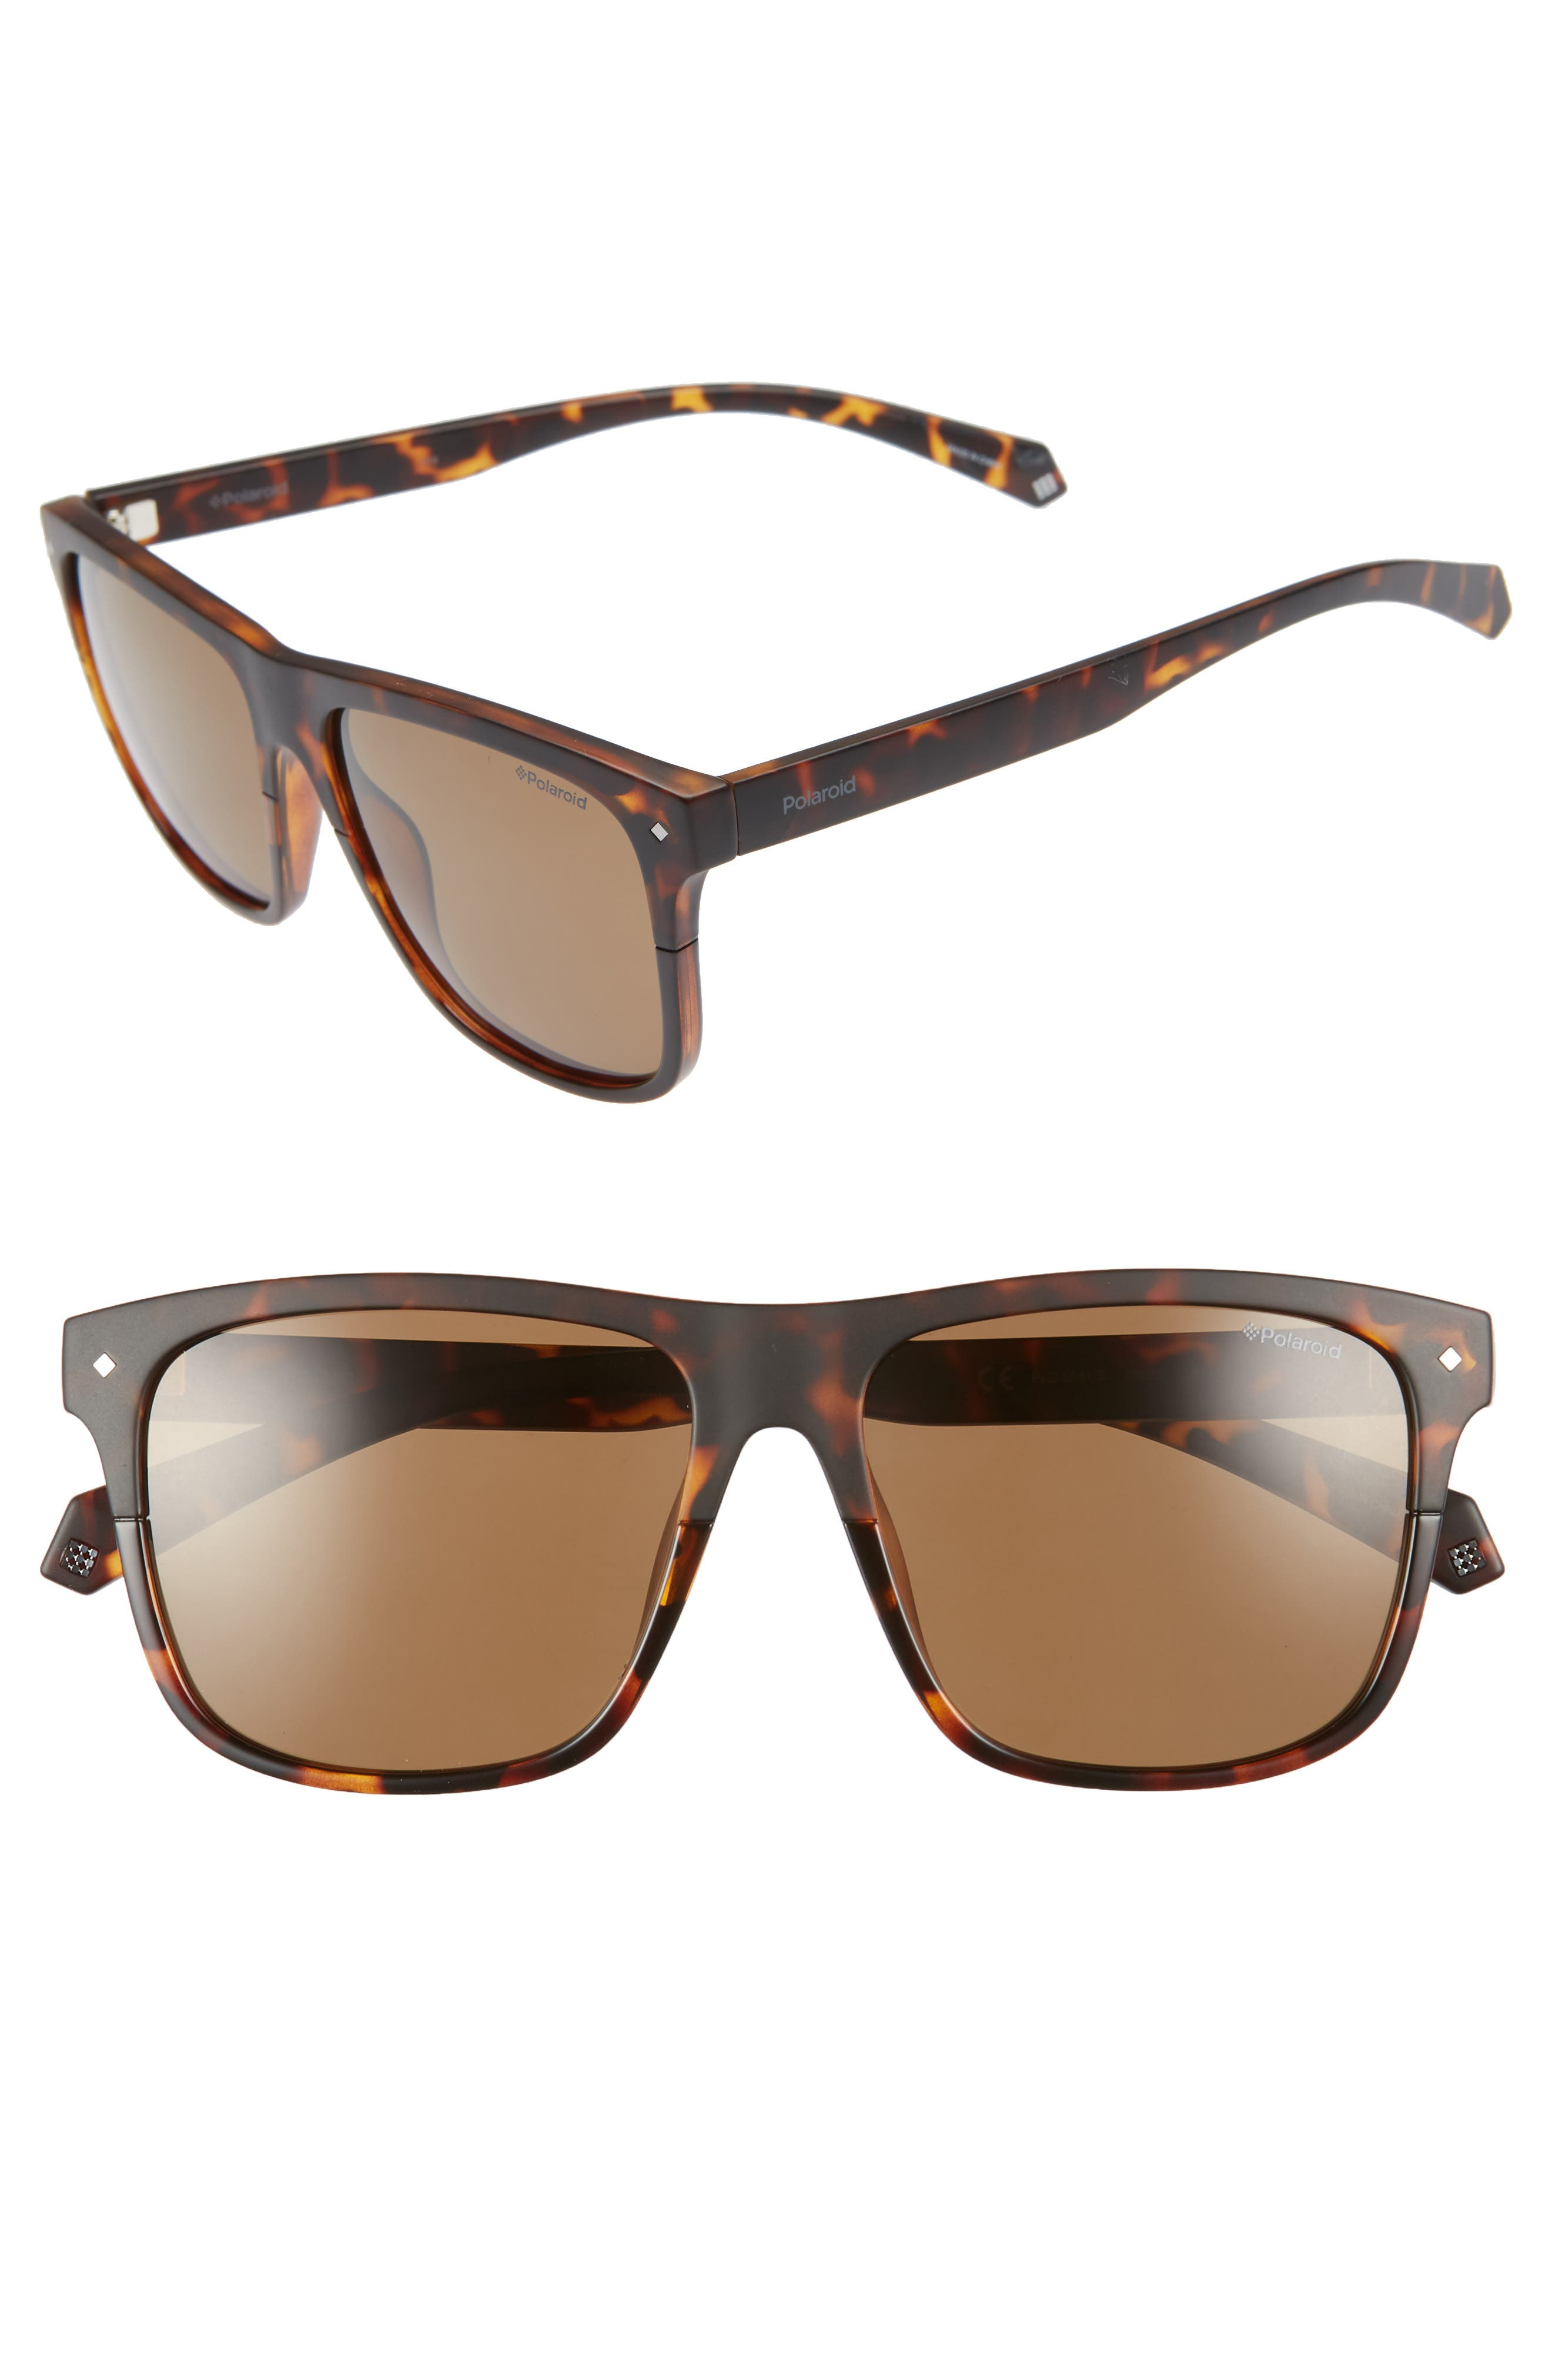 Polaroid Eyewear Flat Top 5m Polarized Sunglasses - Havana